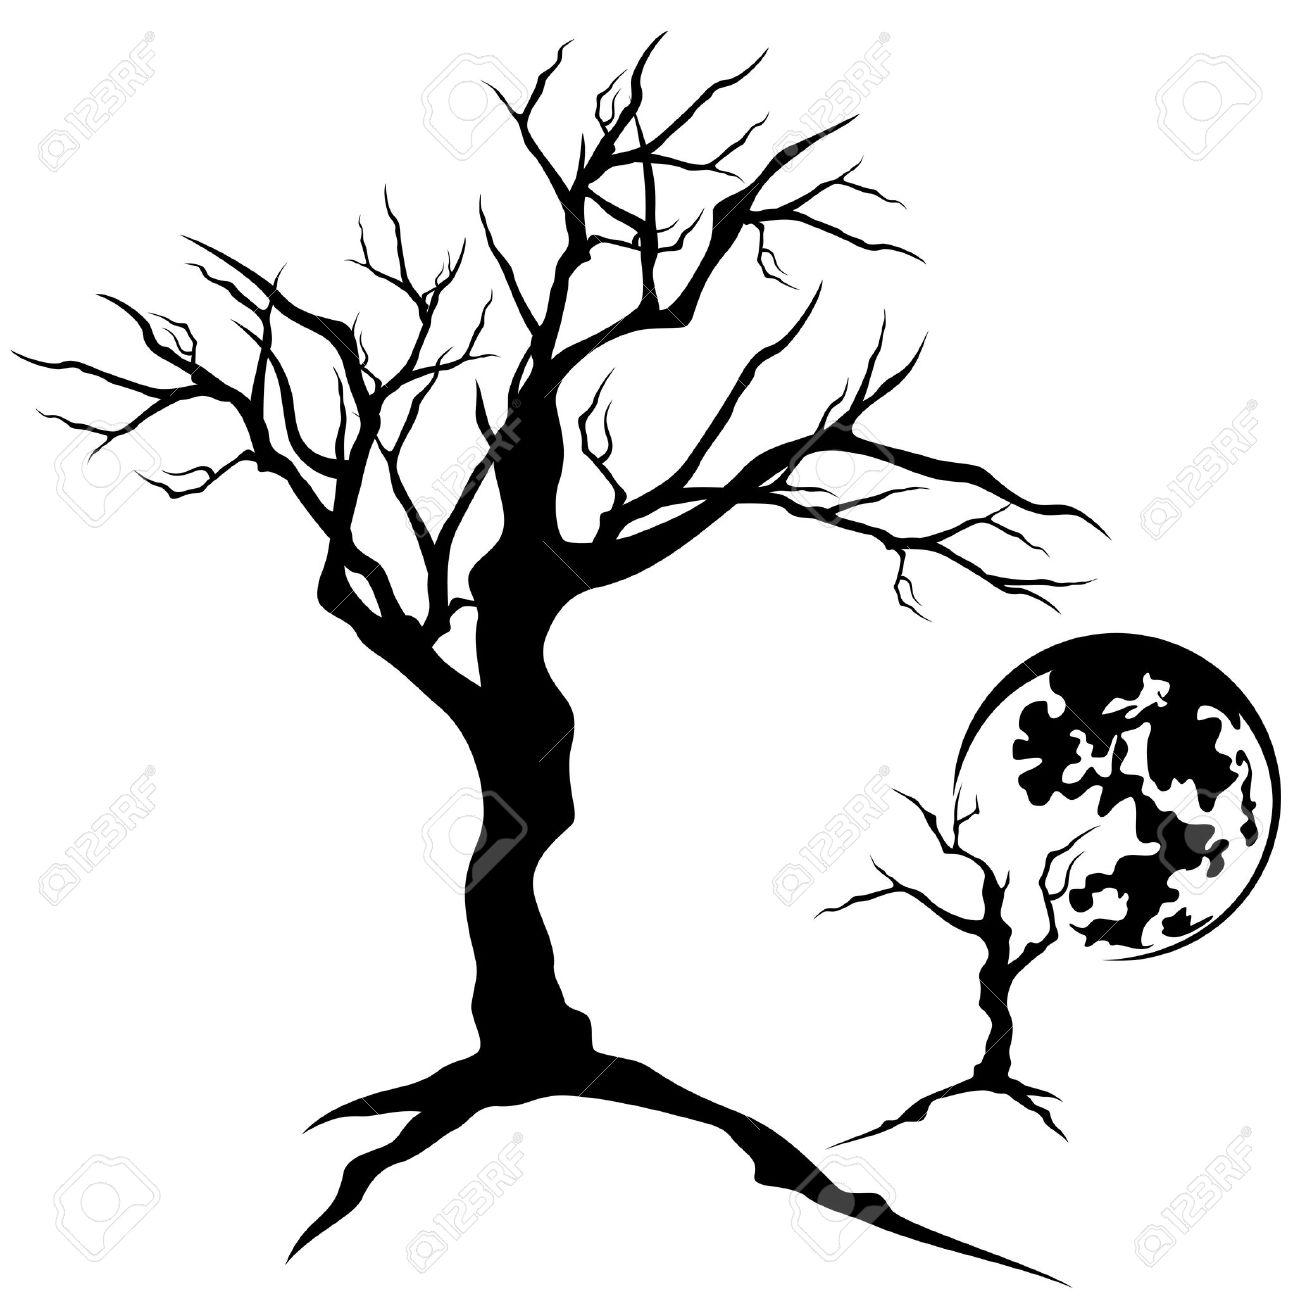 Twisted Tree Design.